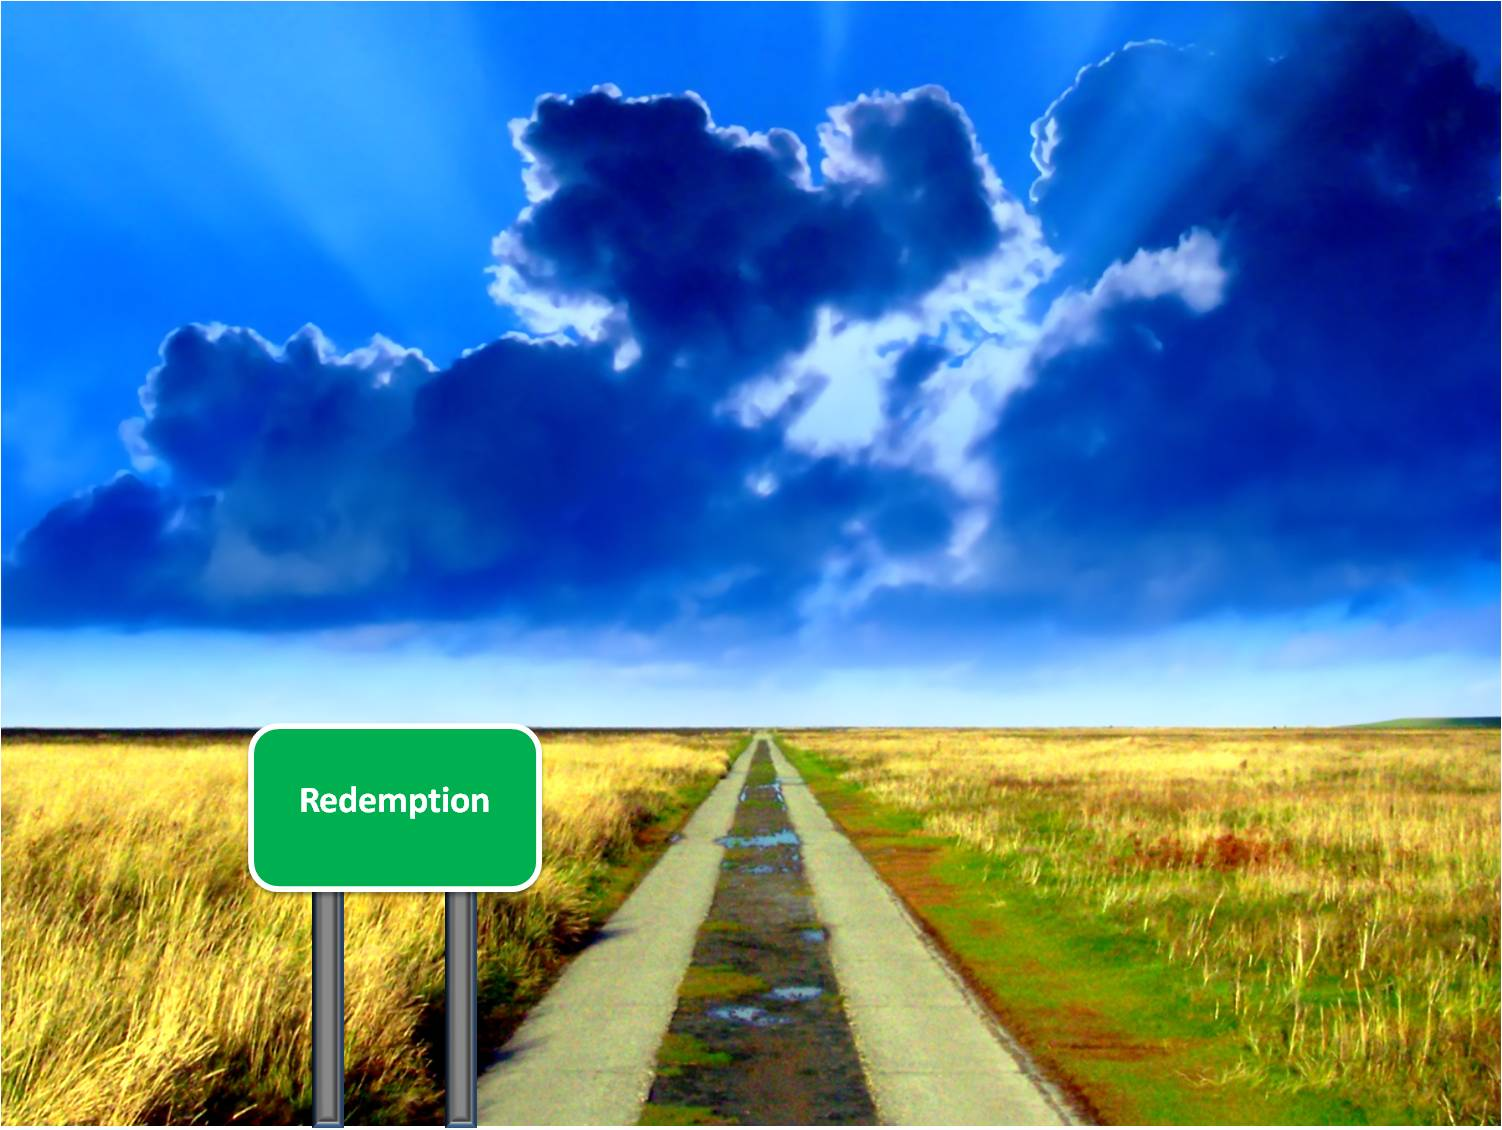 road-to-redemption1.jpg